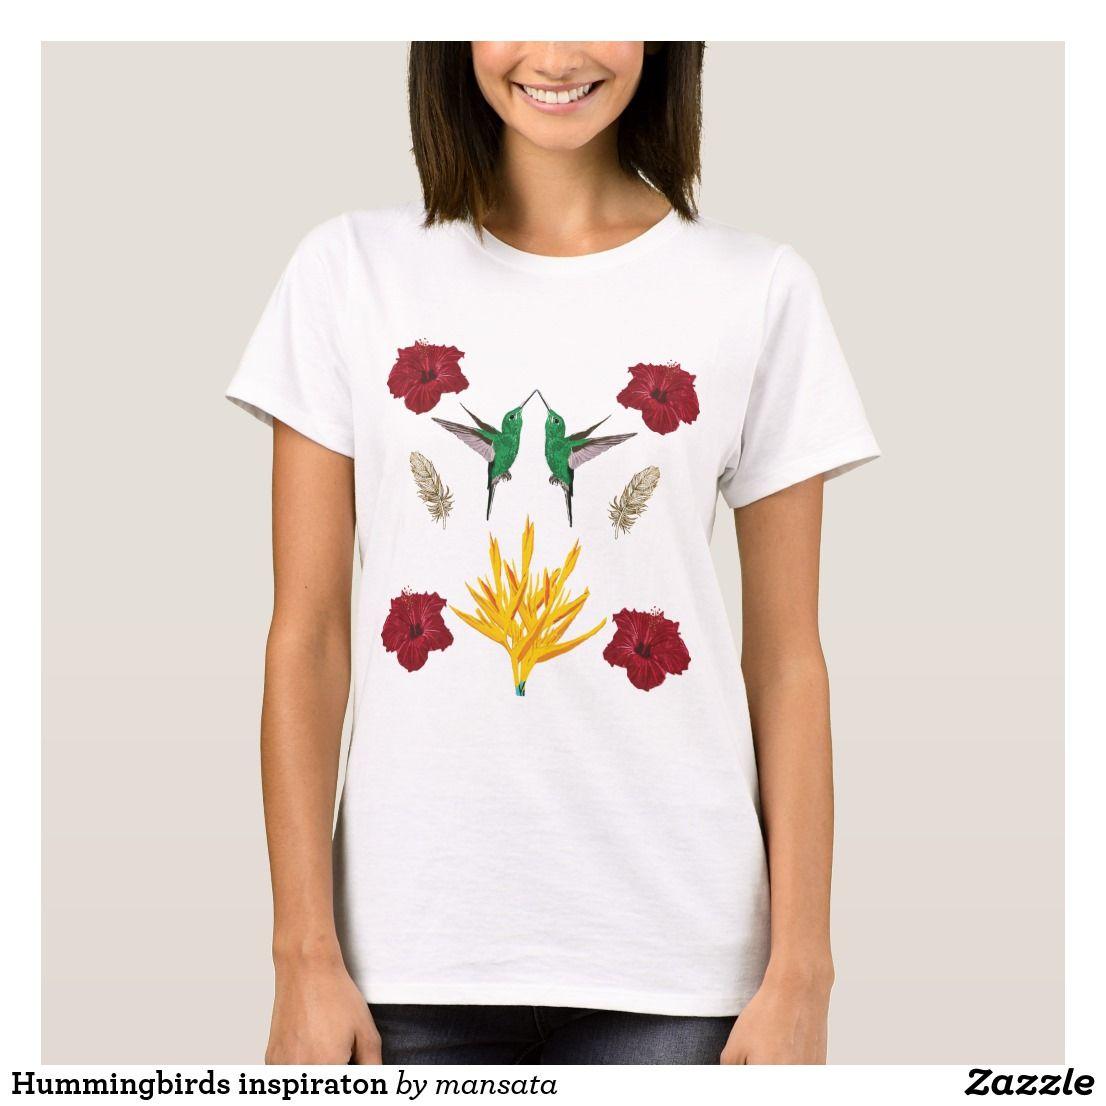 Hummingbirds inspiraton TShirt Zazzle.co.uk Elegant shirt